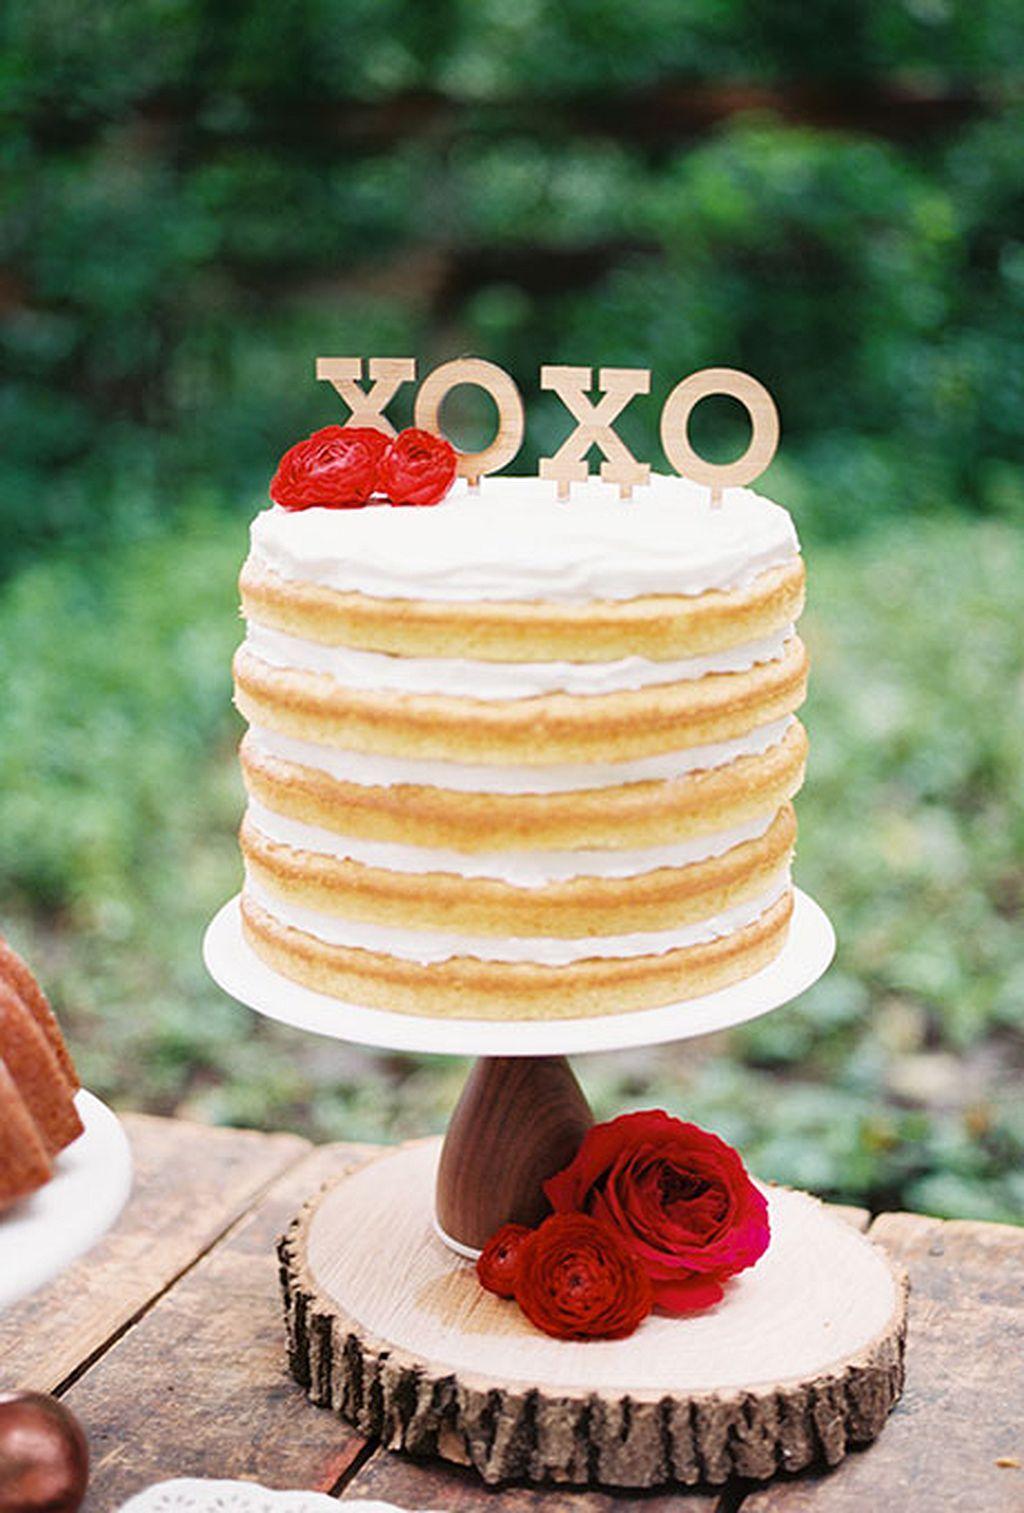 60+ Simple and Elegant Wedding Cake Ideas | Pinterest | Elegant ...